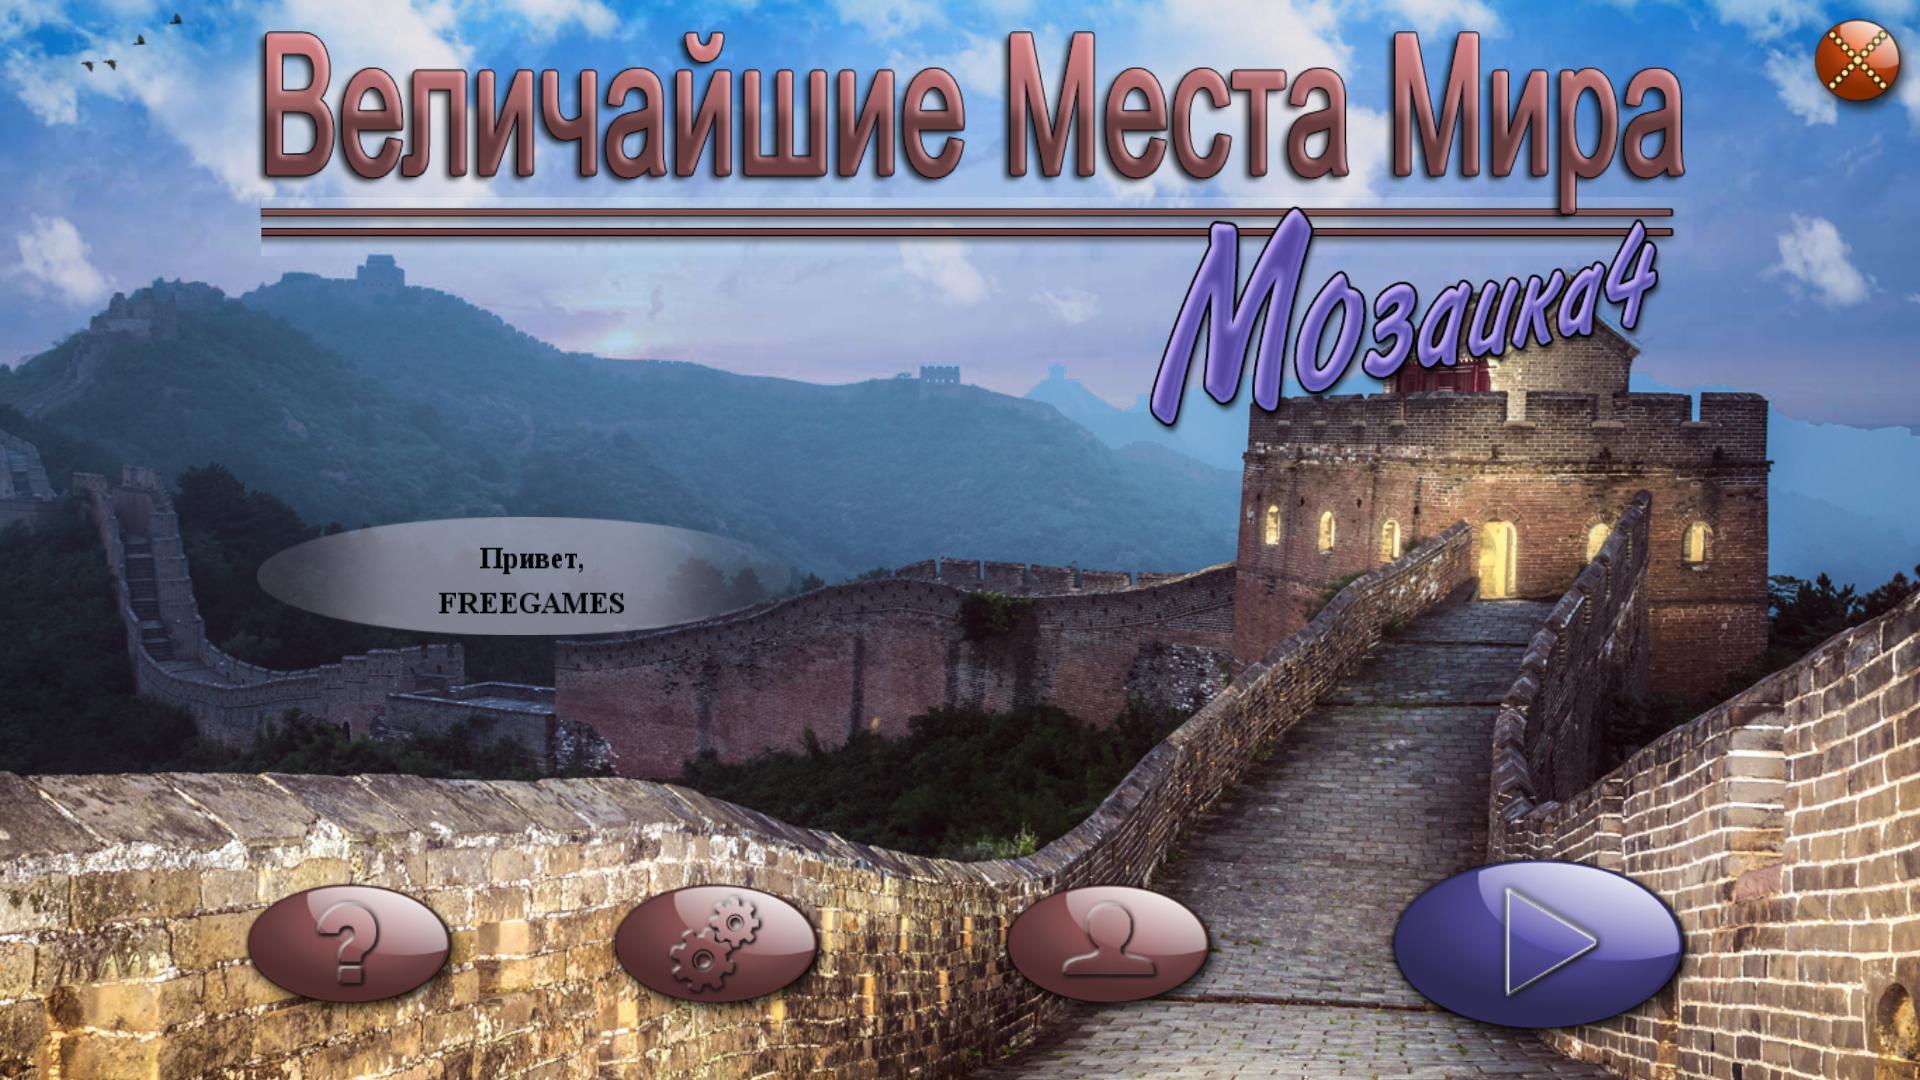 Величайшие места мира. Мозаика 4 | World's Greatest Places Mosaics 4 (Rus)